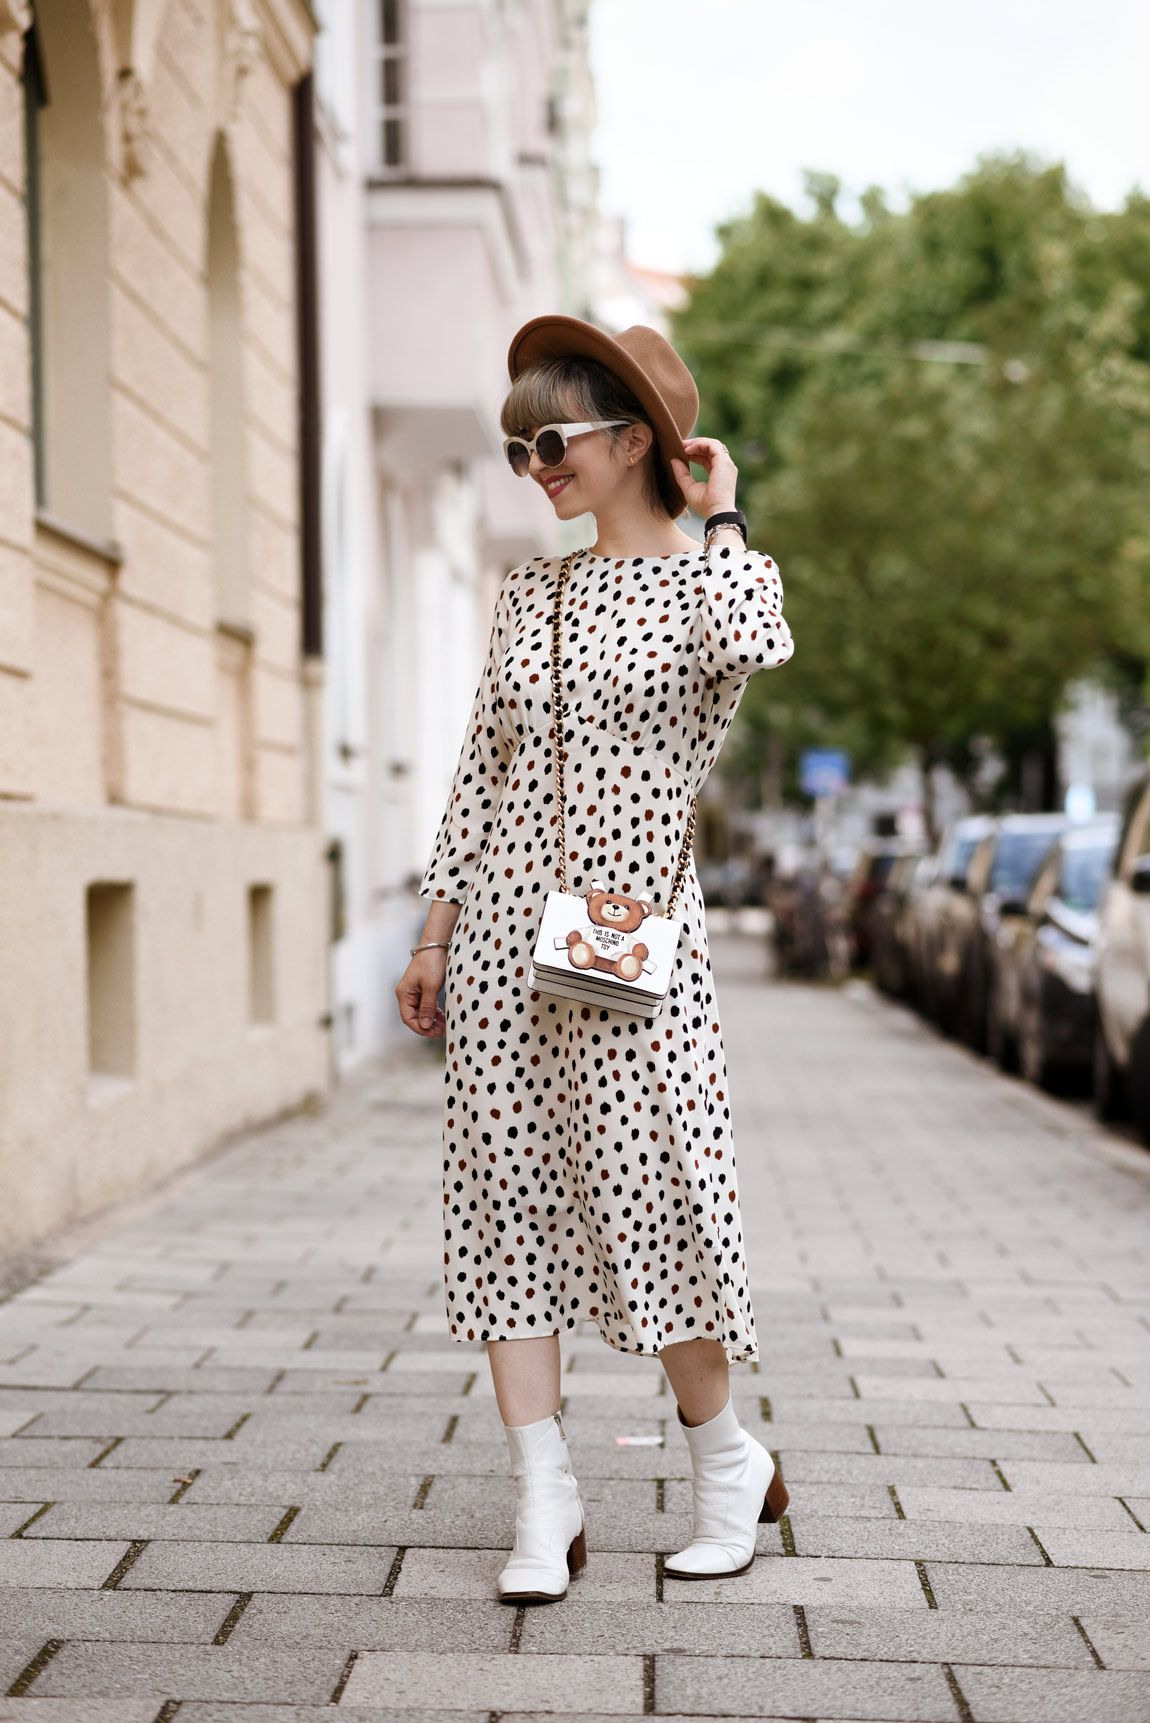 Abend Coolste Kleider Midi Sommer Spezialgebiet20 Elegant Kleider Midi Sommer Stylish